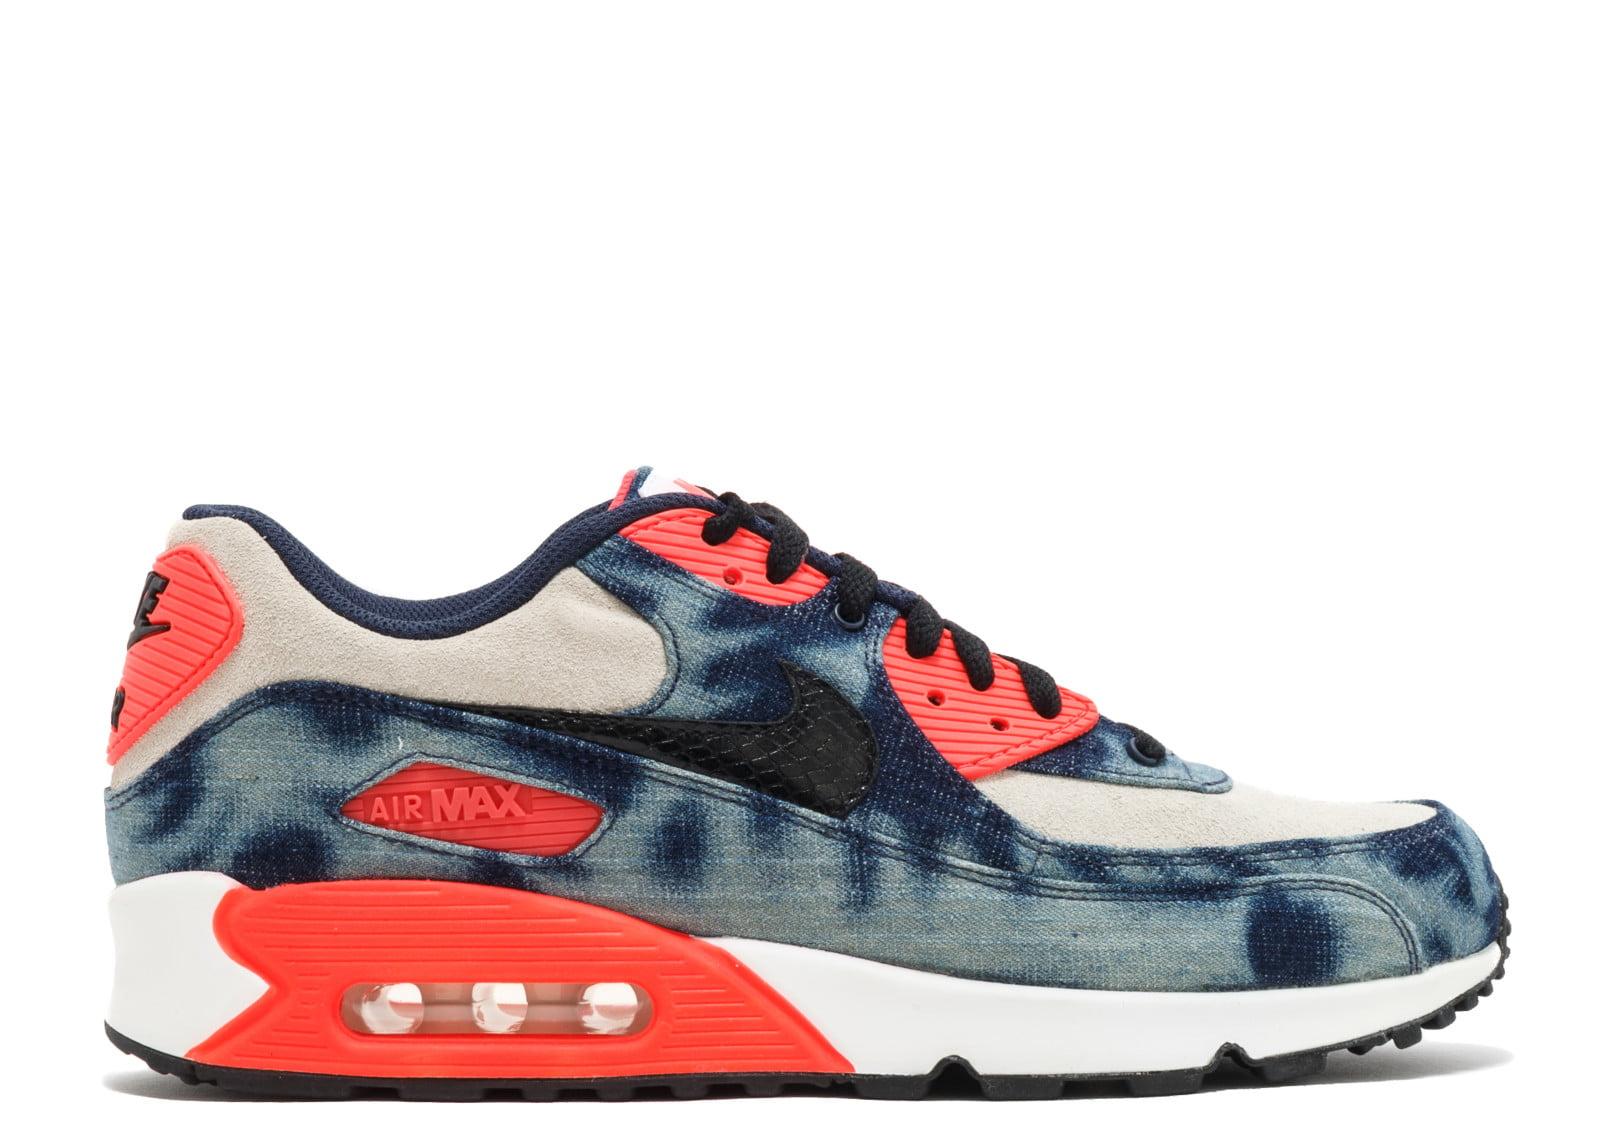 559067c6c9 Nike - Men - Air Max 90 Dnm Qs 'Infrared Washed Denim' - 700875-400 - Size  10.5